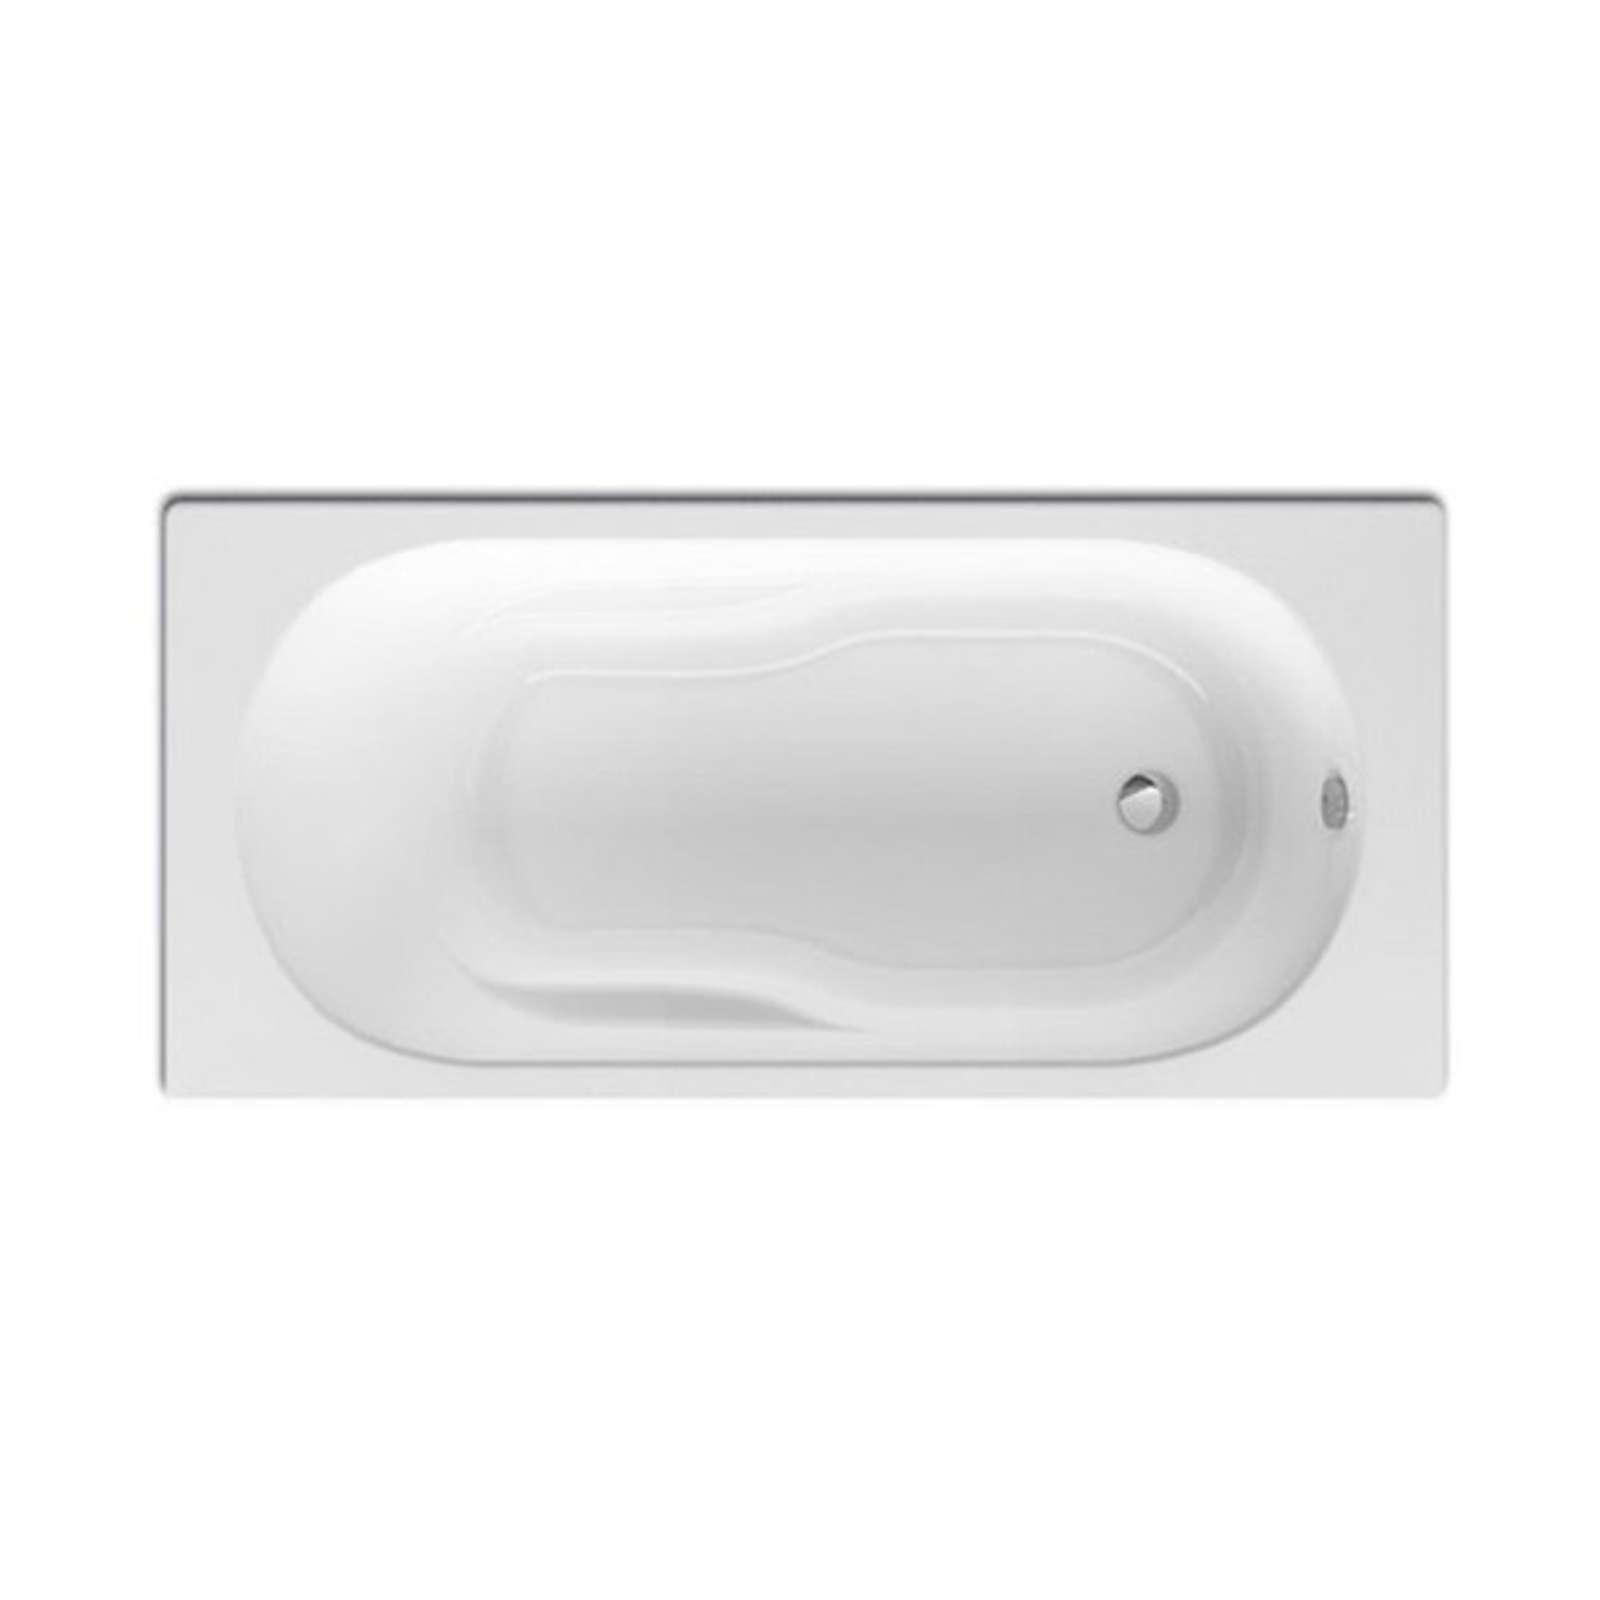 Ванна акриловая Roca Genova_N 150х75